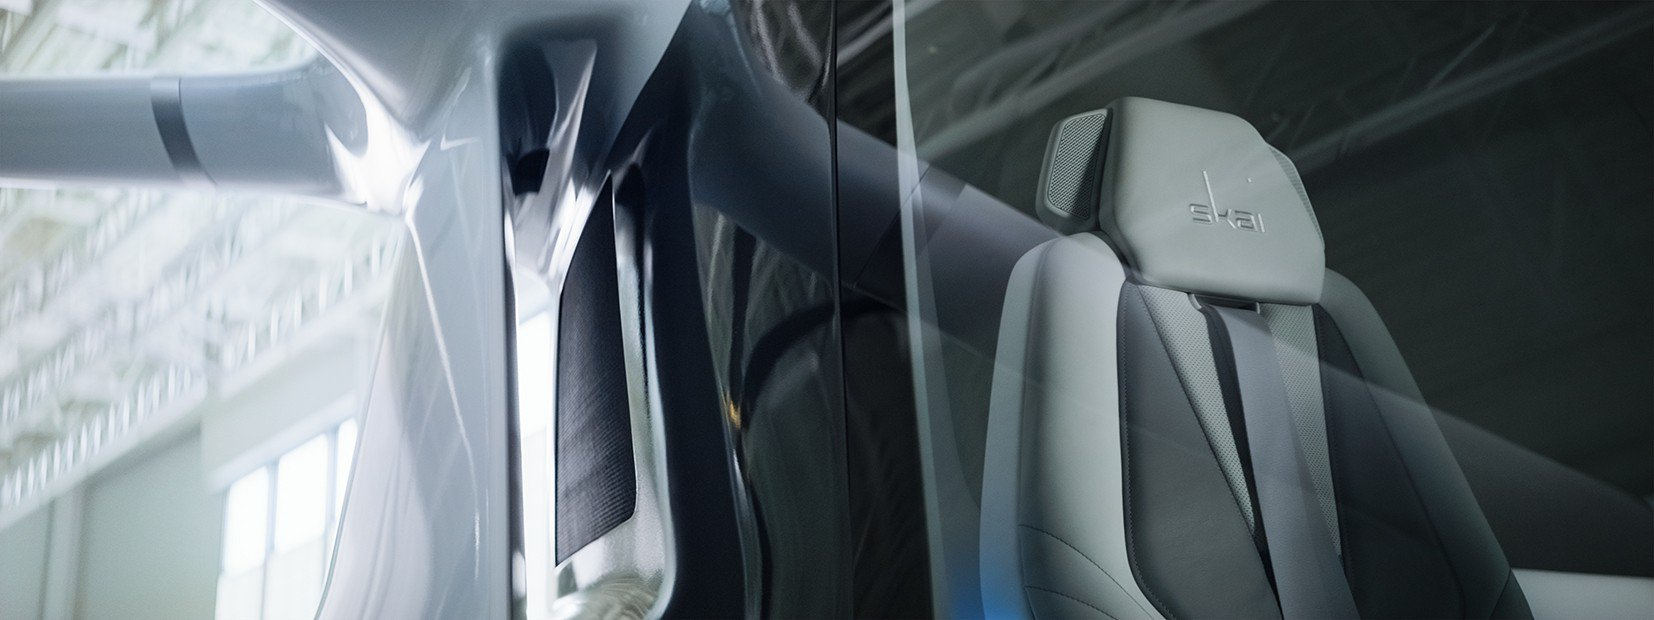 Alakai-Technologies-Skai-flying-car-11